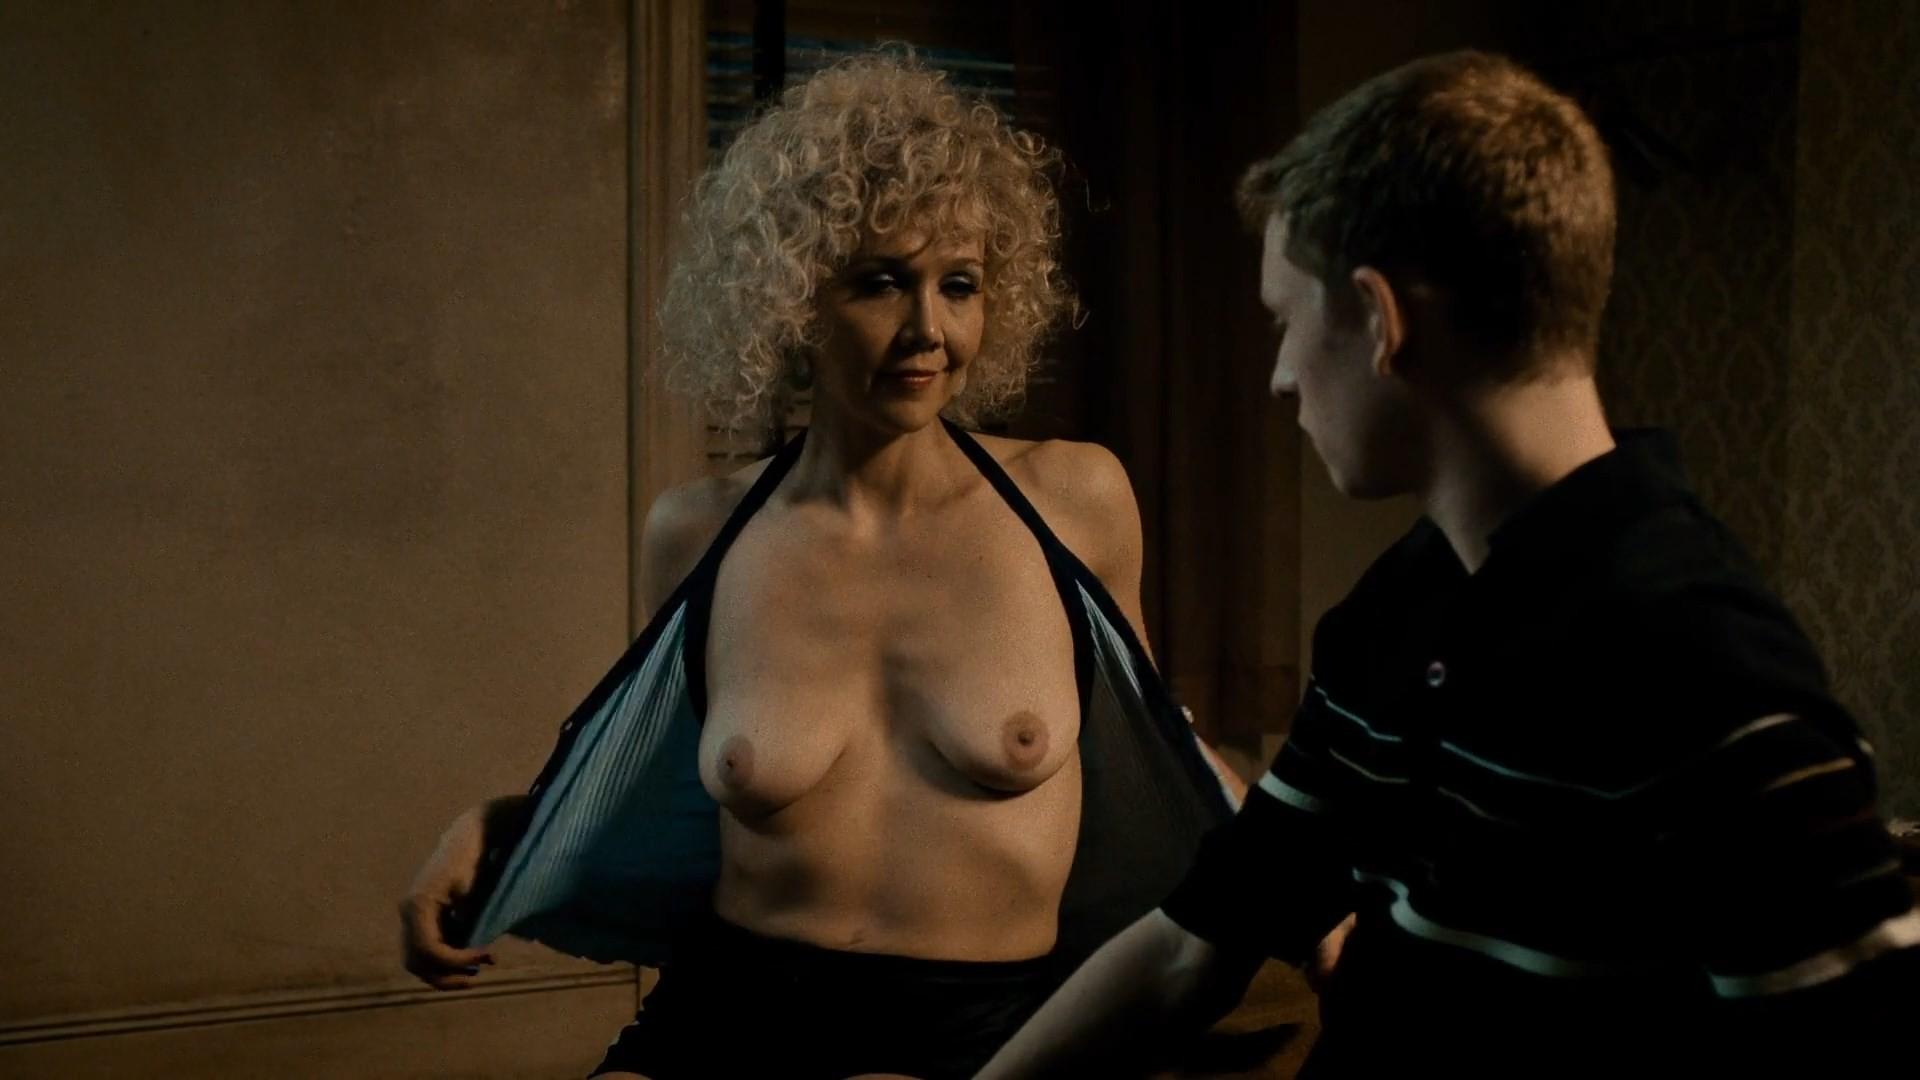 molodie-aktrisi-eroticheskogo-kino-porno-video-v-kontakte-satin-shelk